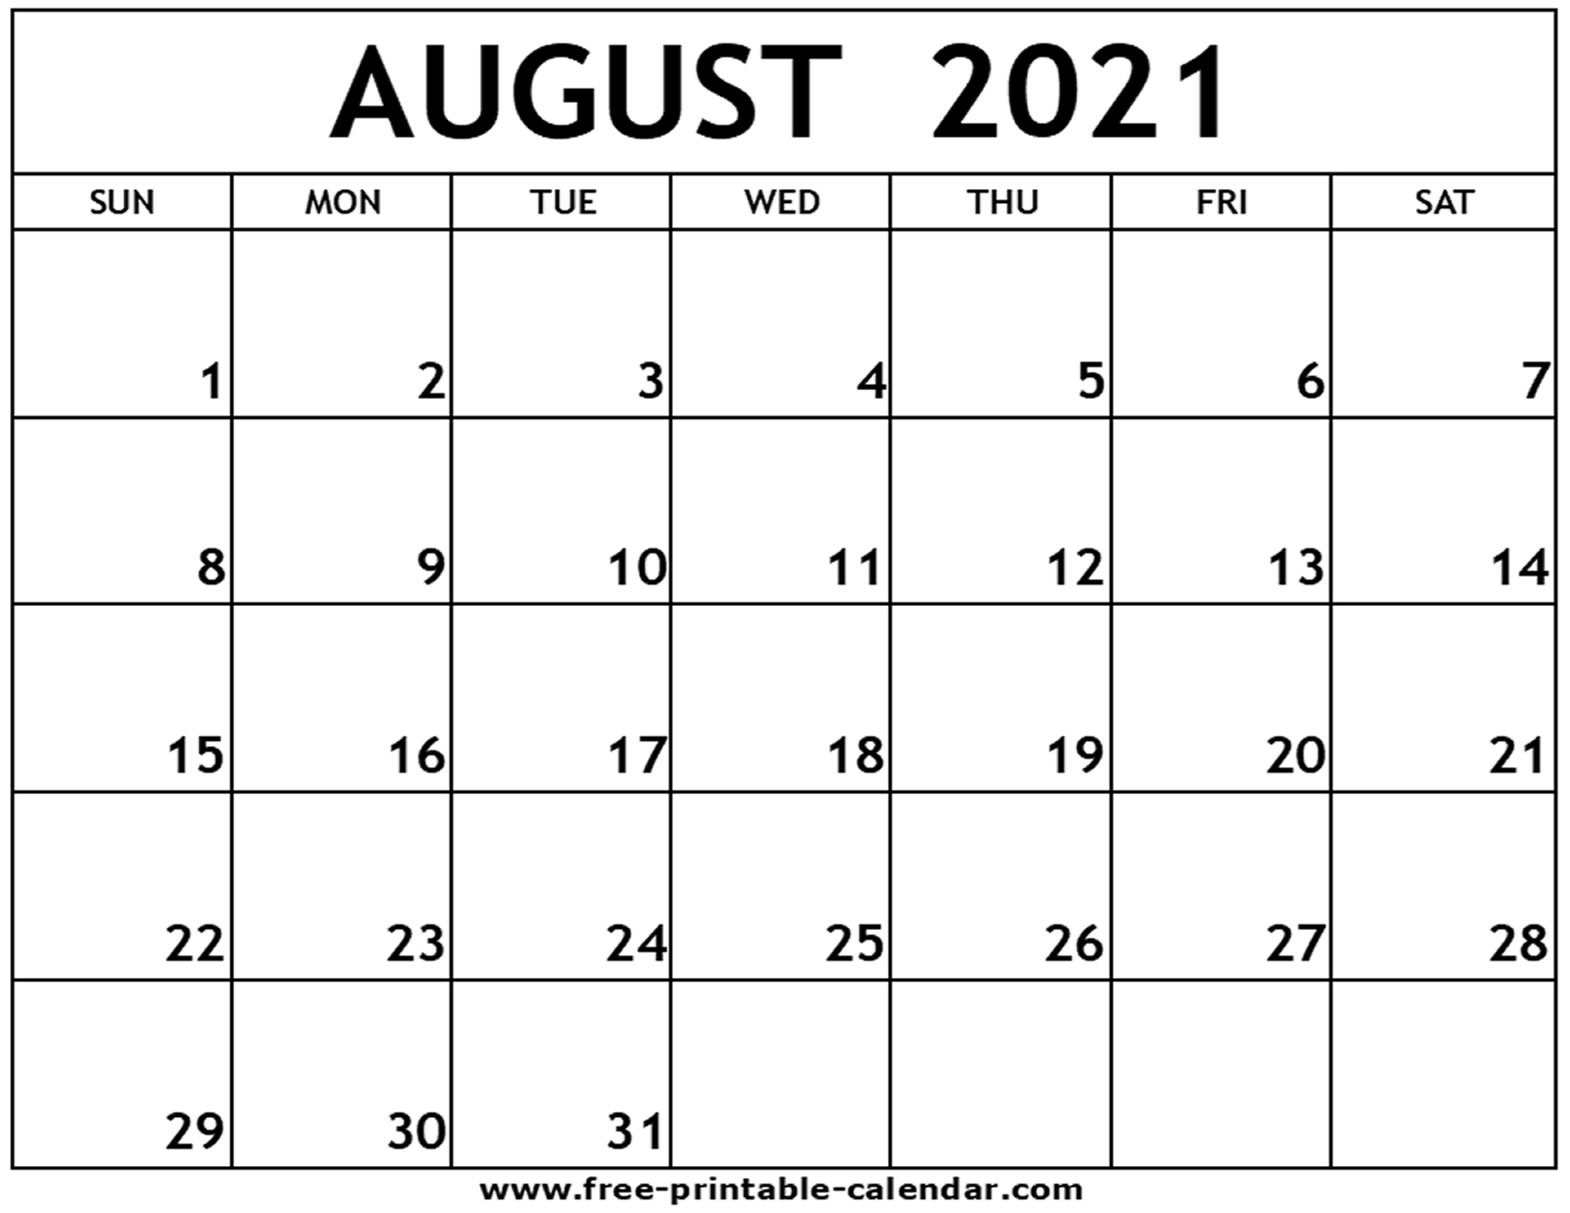 Pick 2021 August Calendar Printable